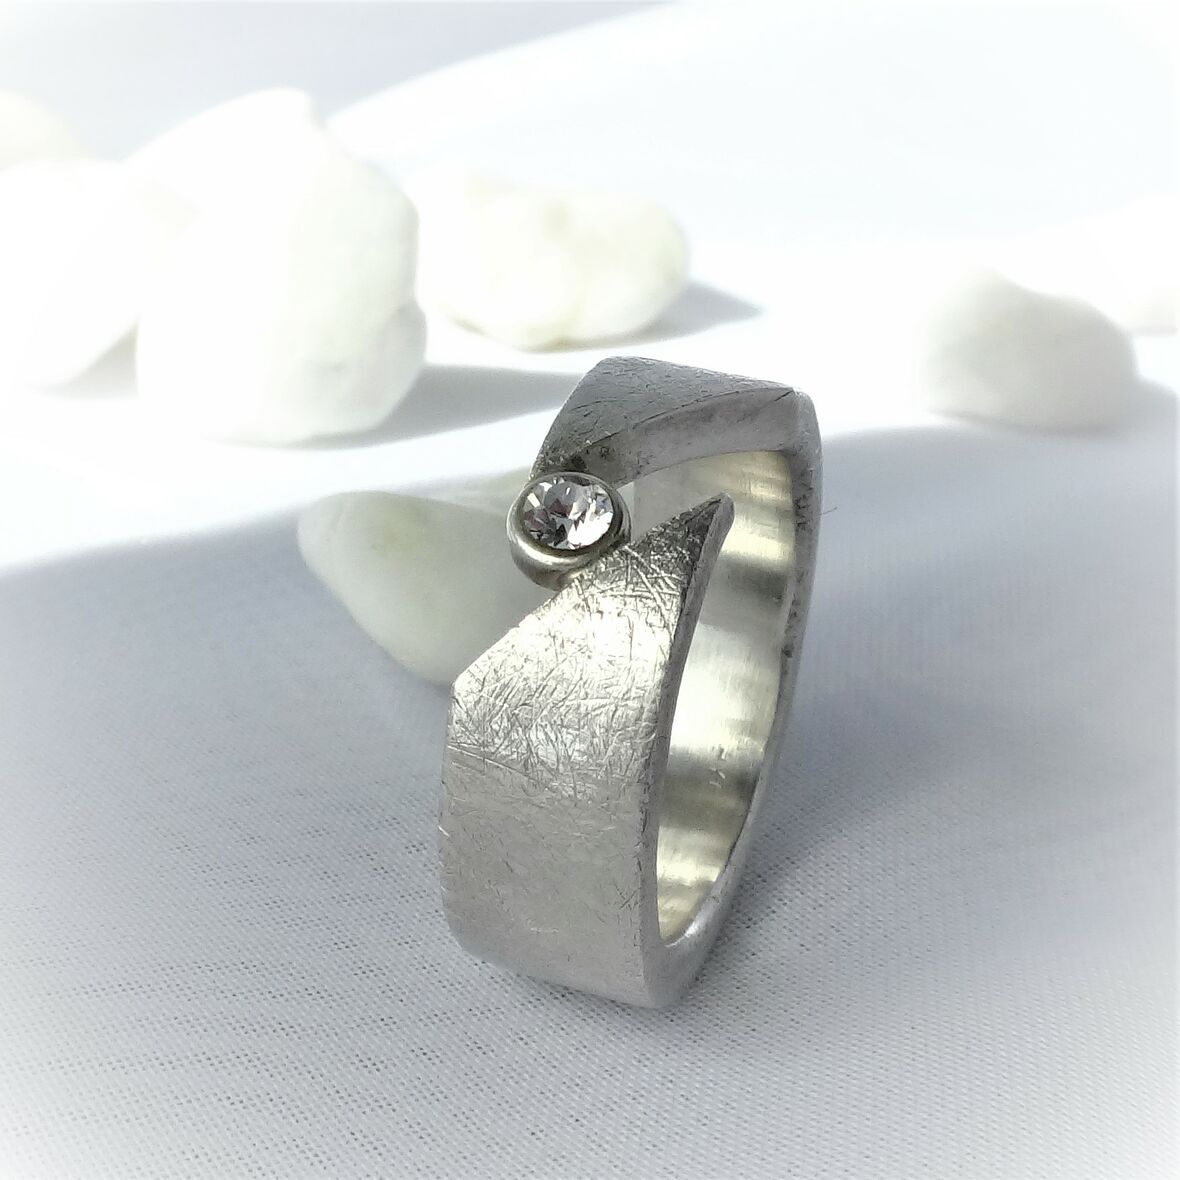 Diamant Silber Ring Silber Swarovski 925 Ring K3JF1cTl